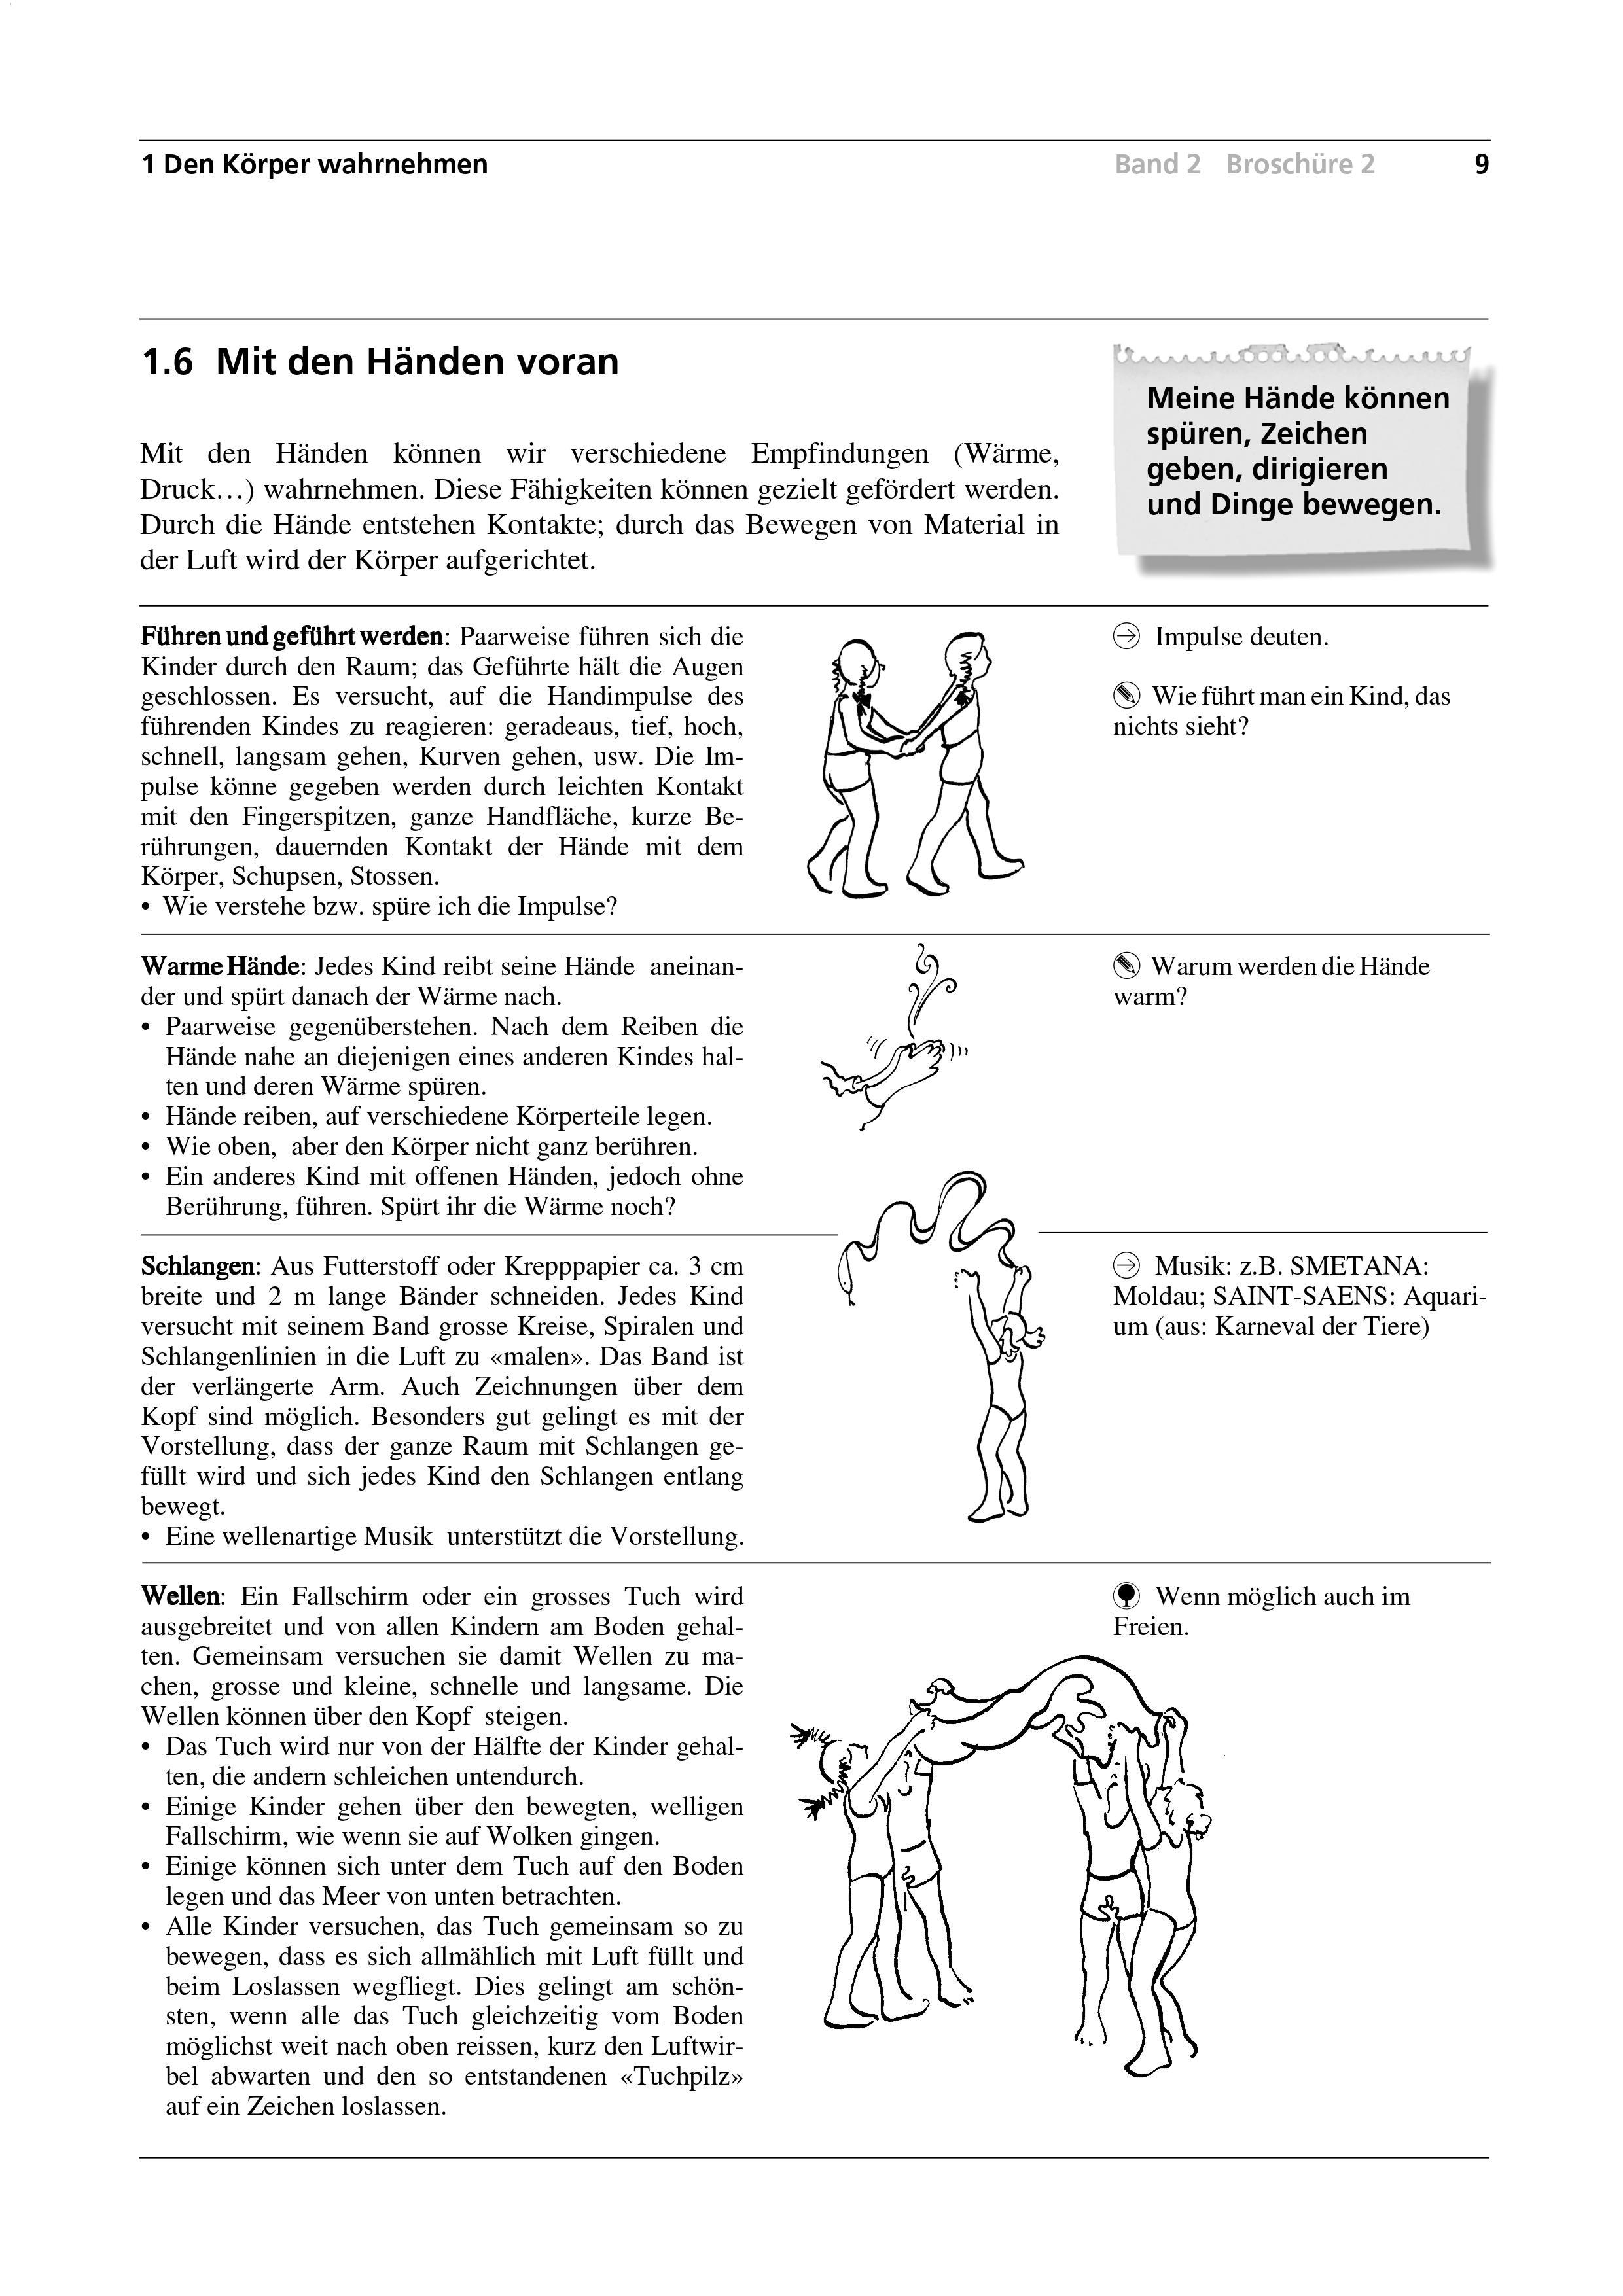 Preview image for LOM object Mit den Händen voran